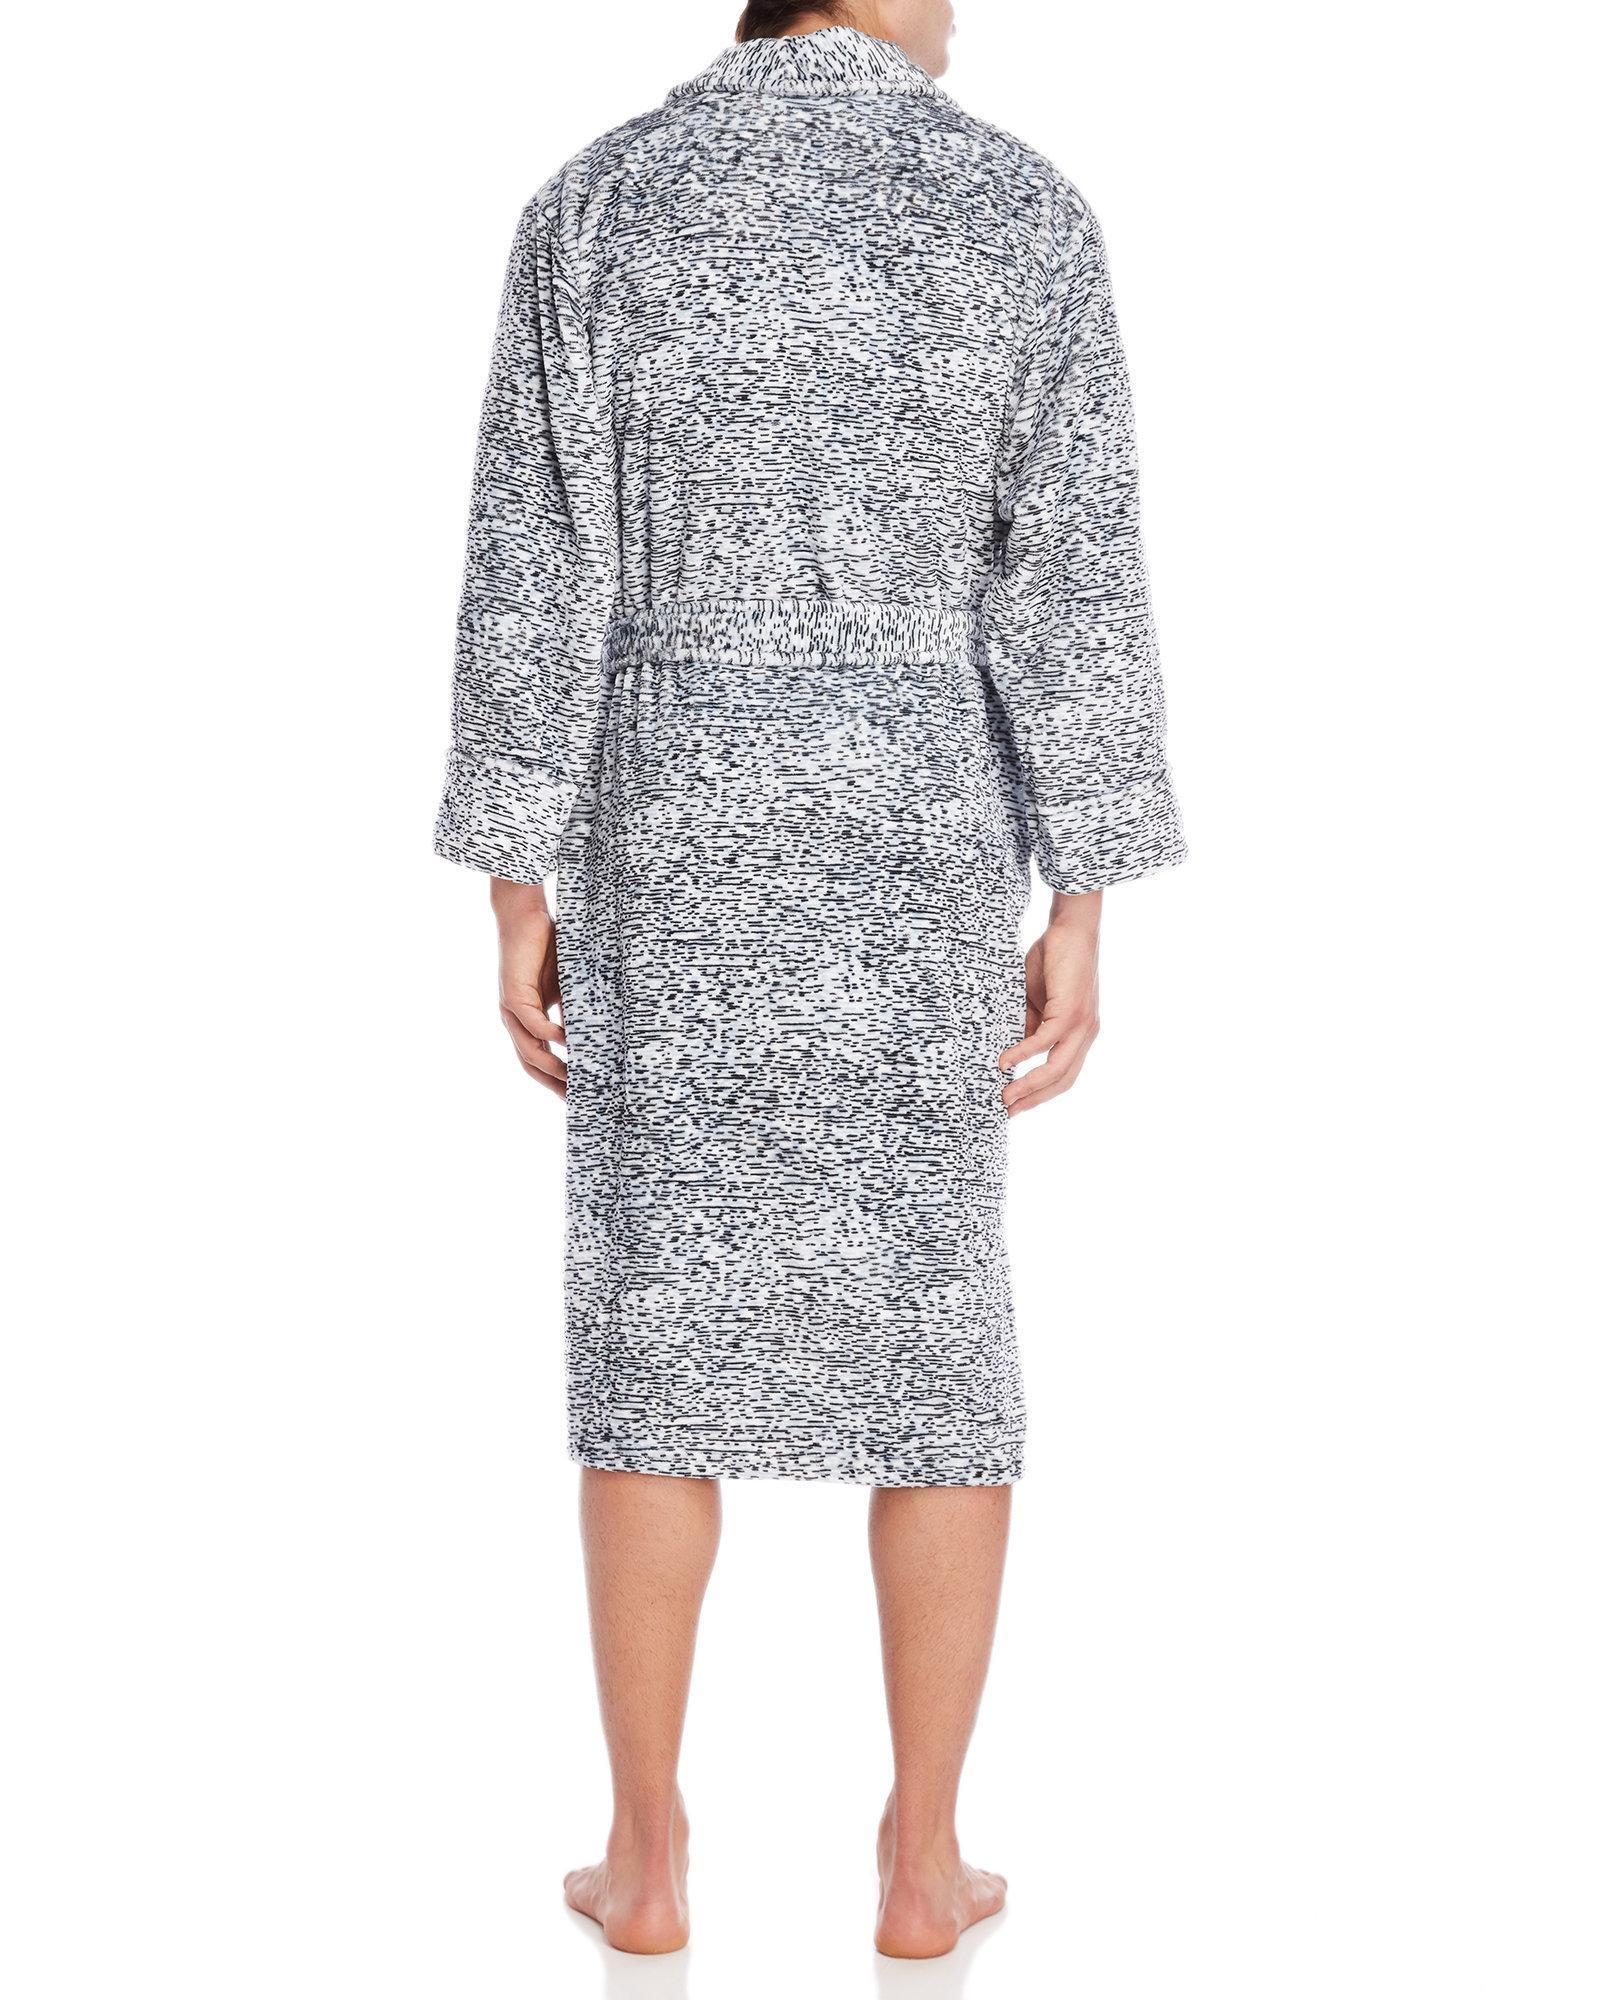 Lyst - Daniel Buchler Stripe Plush Robe in Gray for Men b0d543bf8